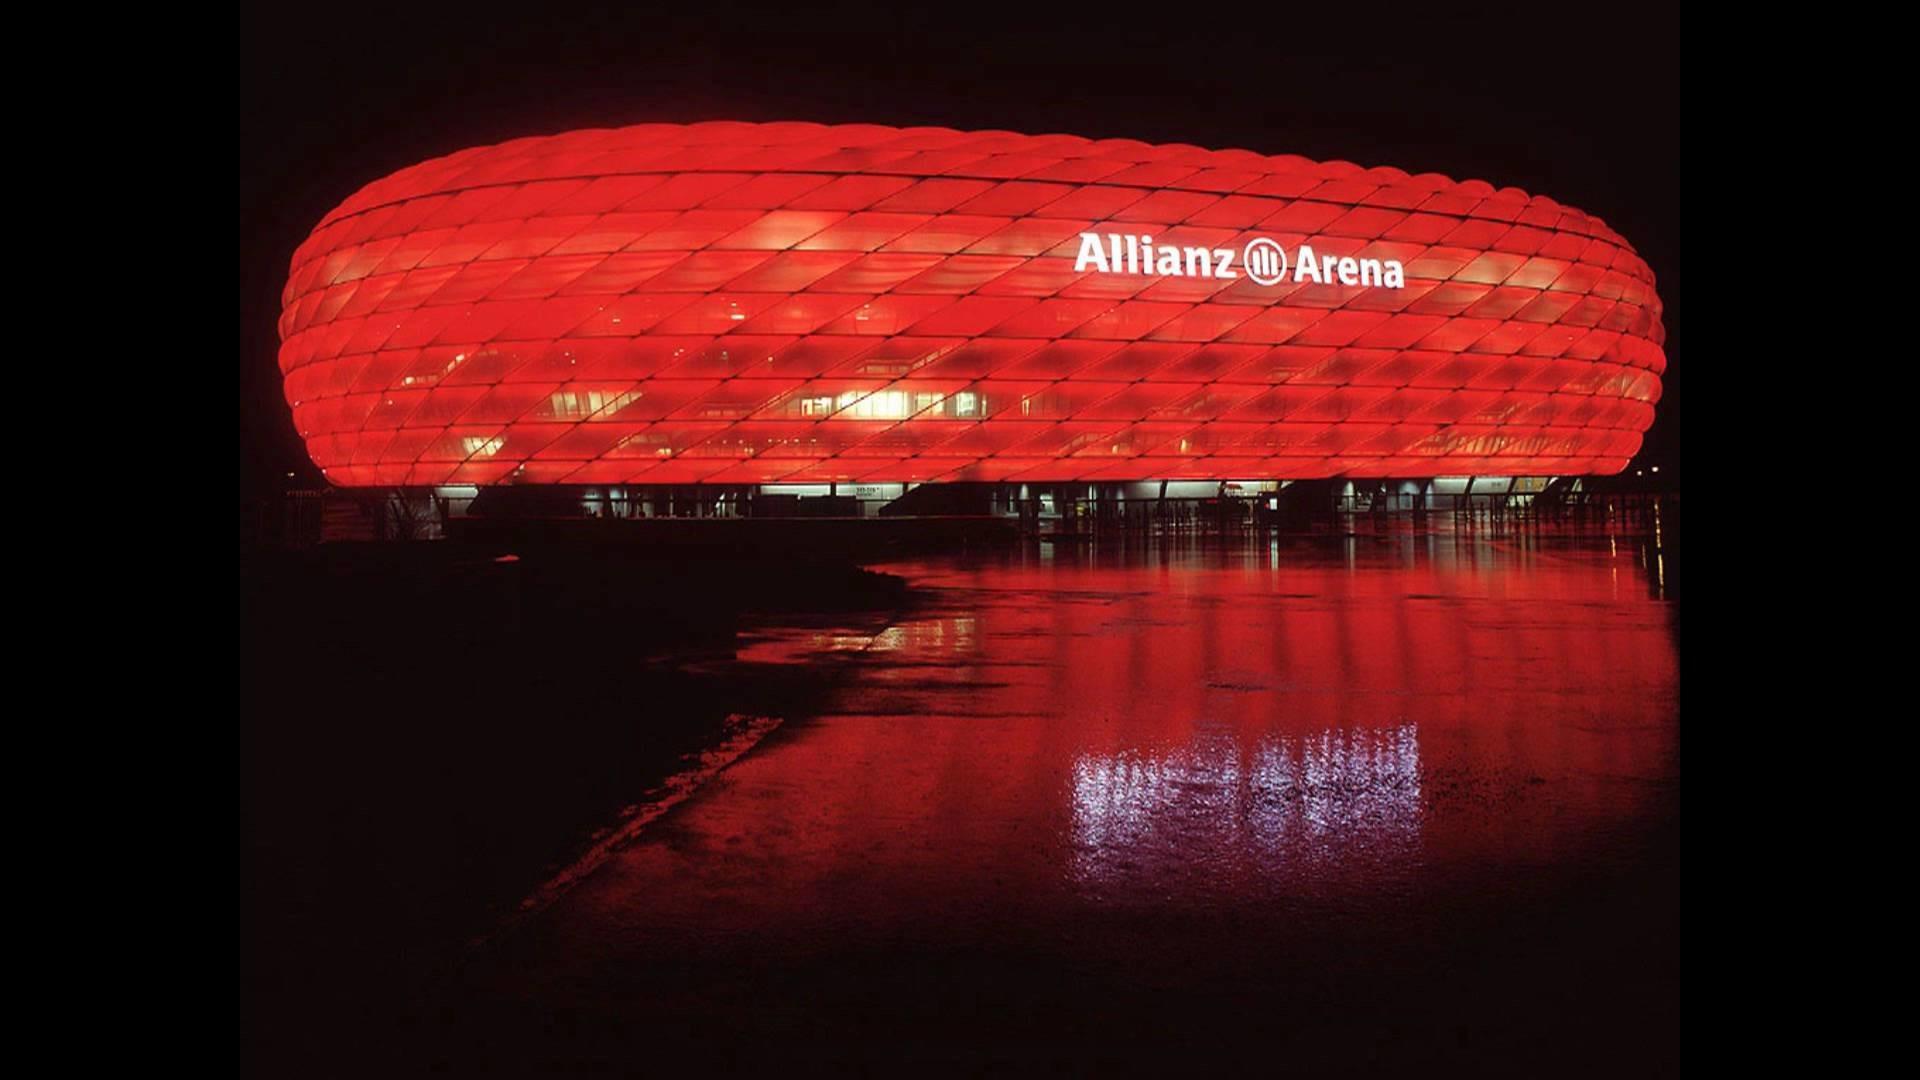 Allianz Arena Wallpapers – Wallpaper Cave